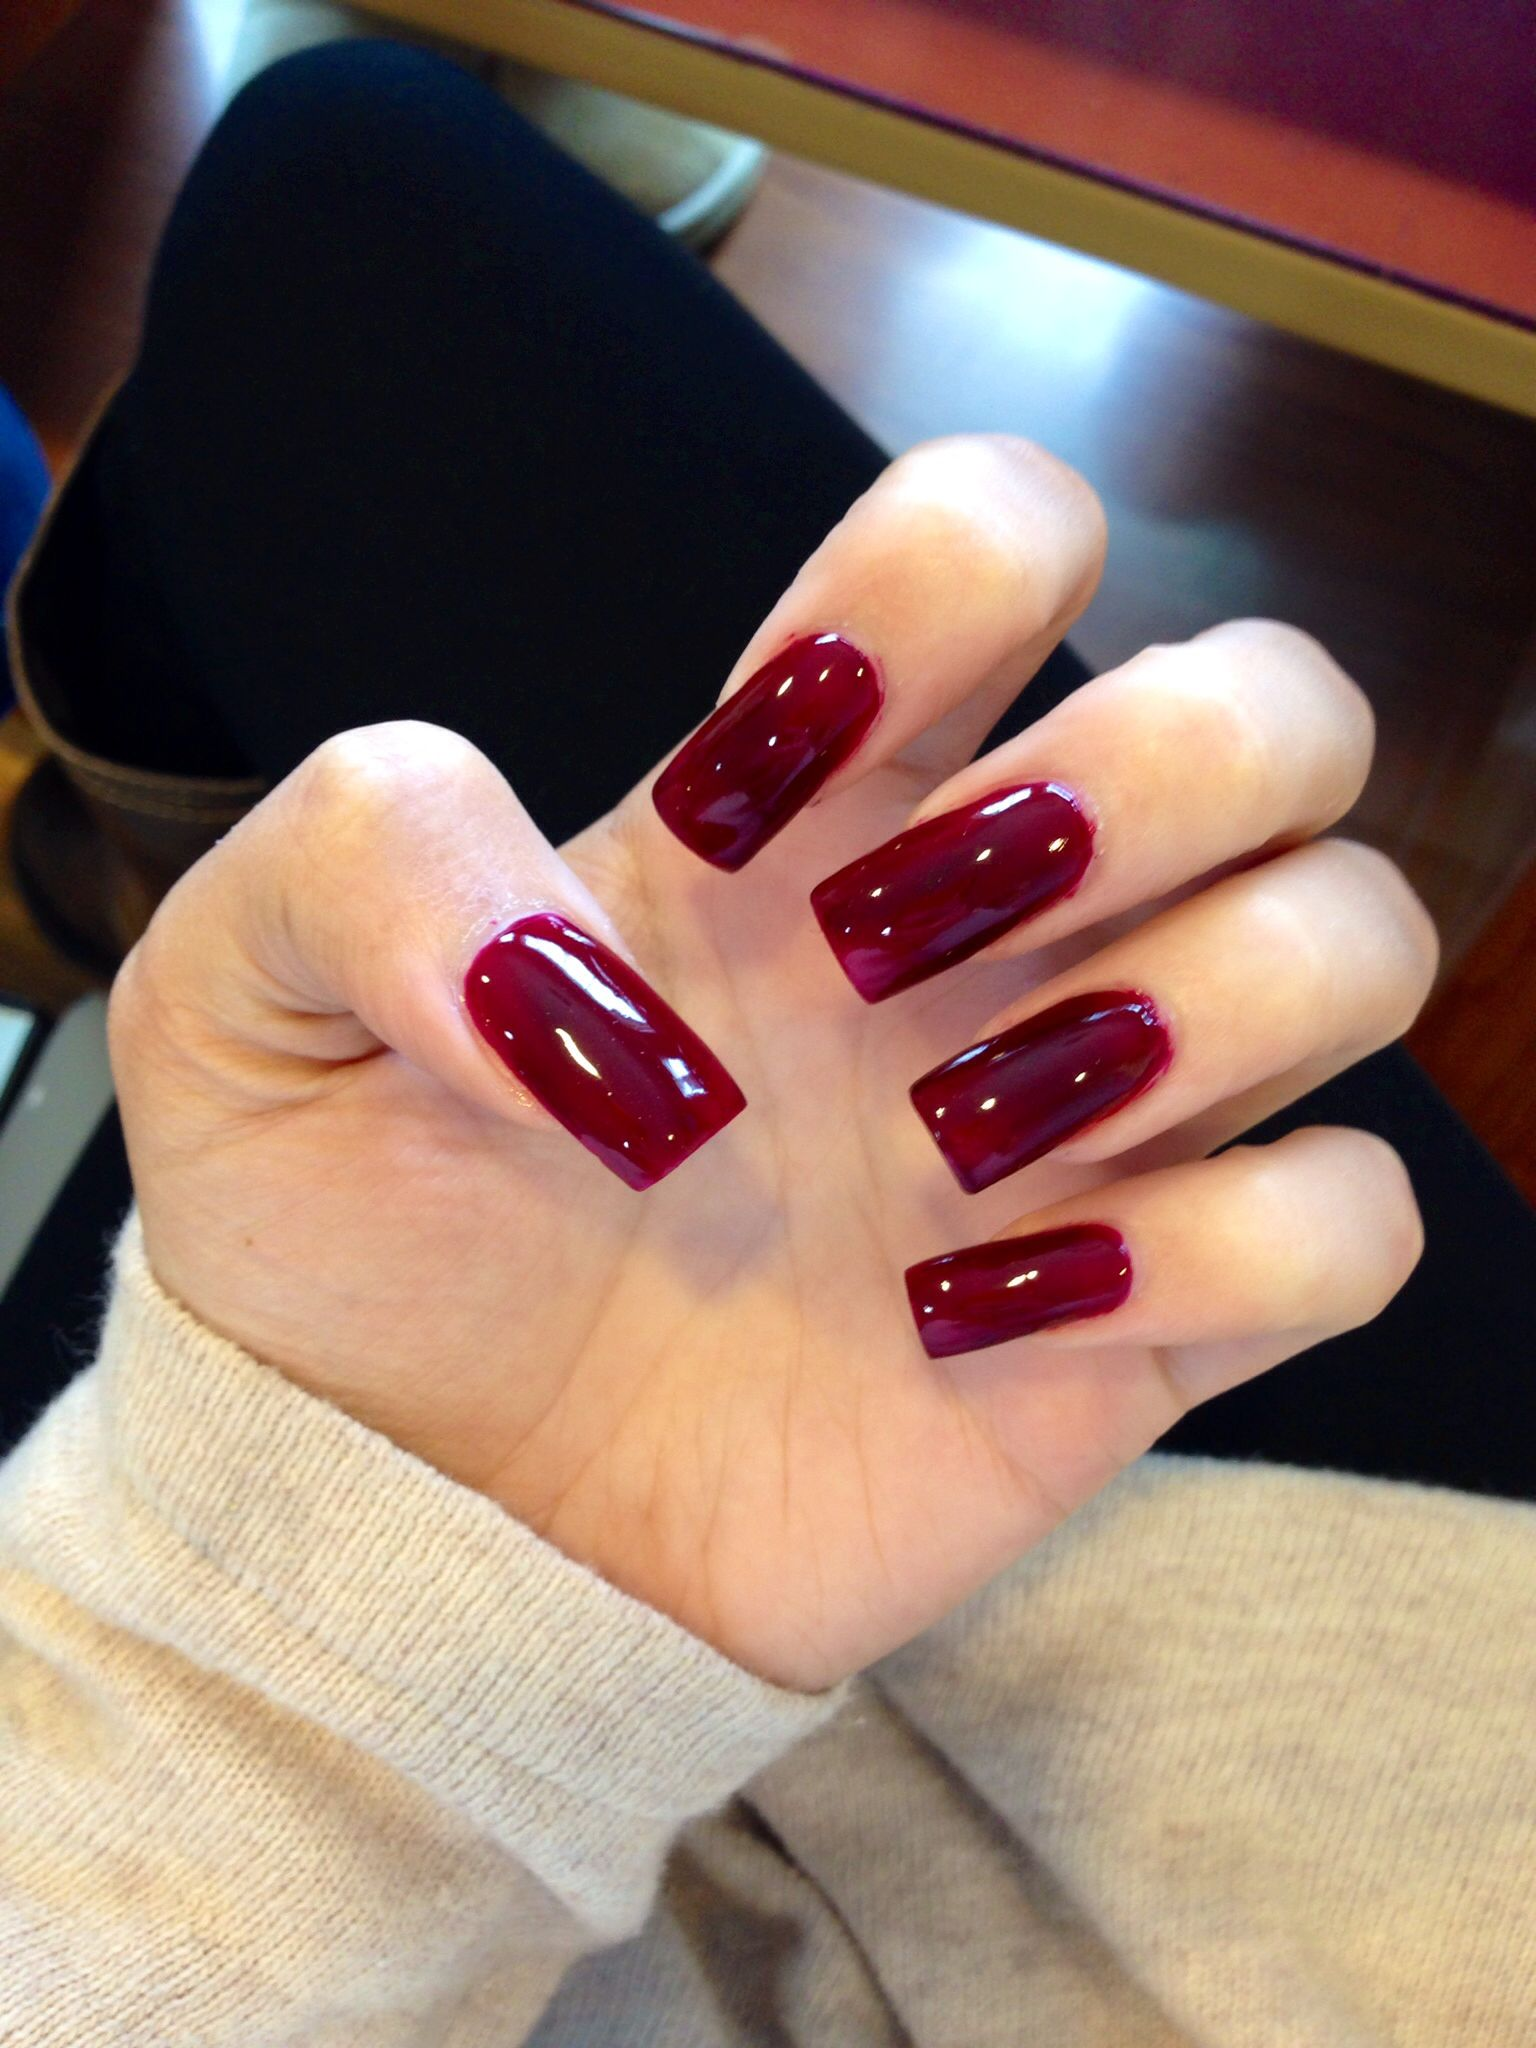 Long burgundy acrylic square nails. | Nails | Pinterest | Square ...